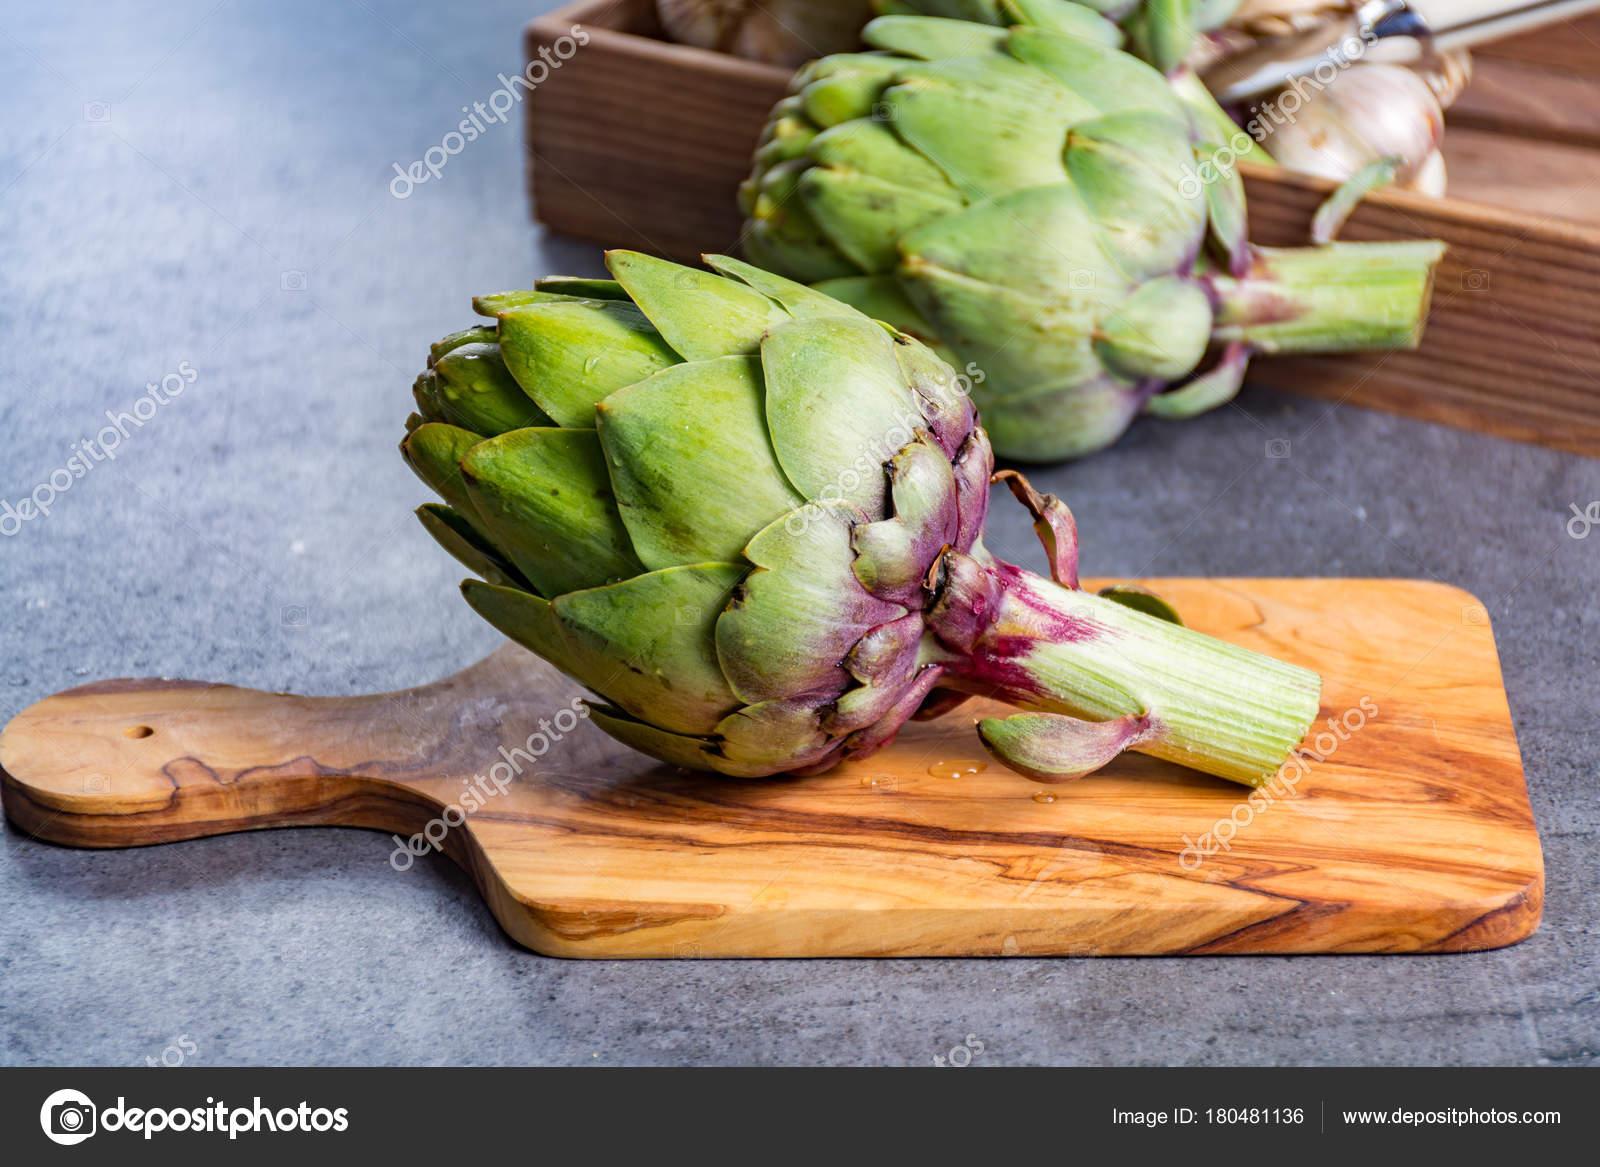 Green Ripe Raw Big Artichokes Heads Ready Cook — Stock Photo